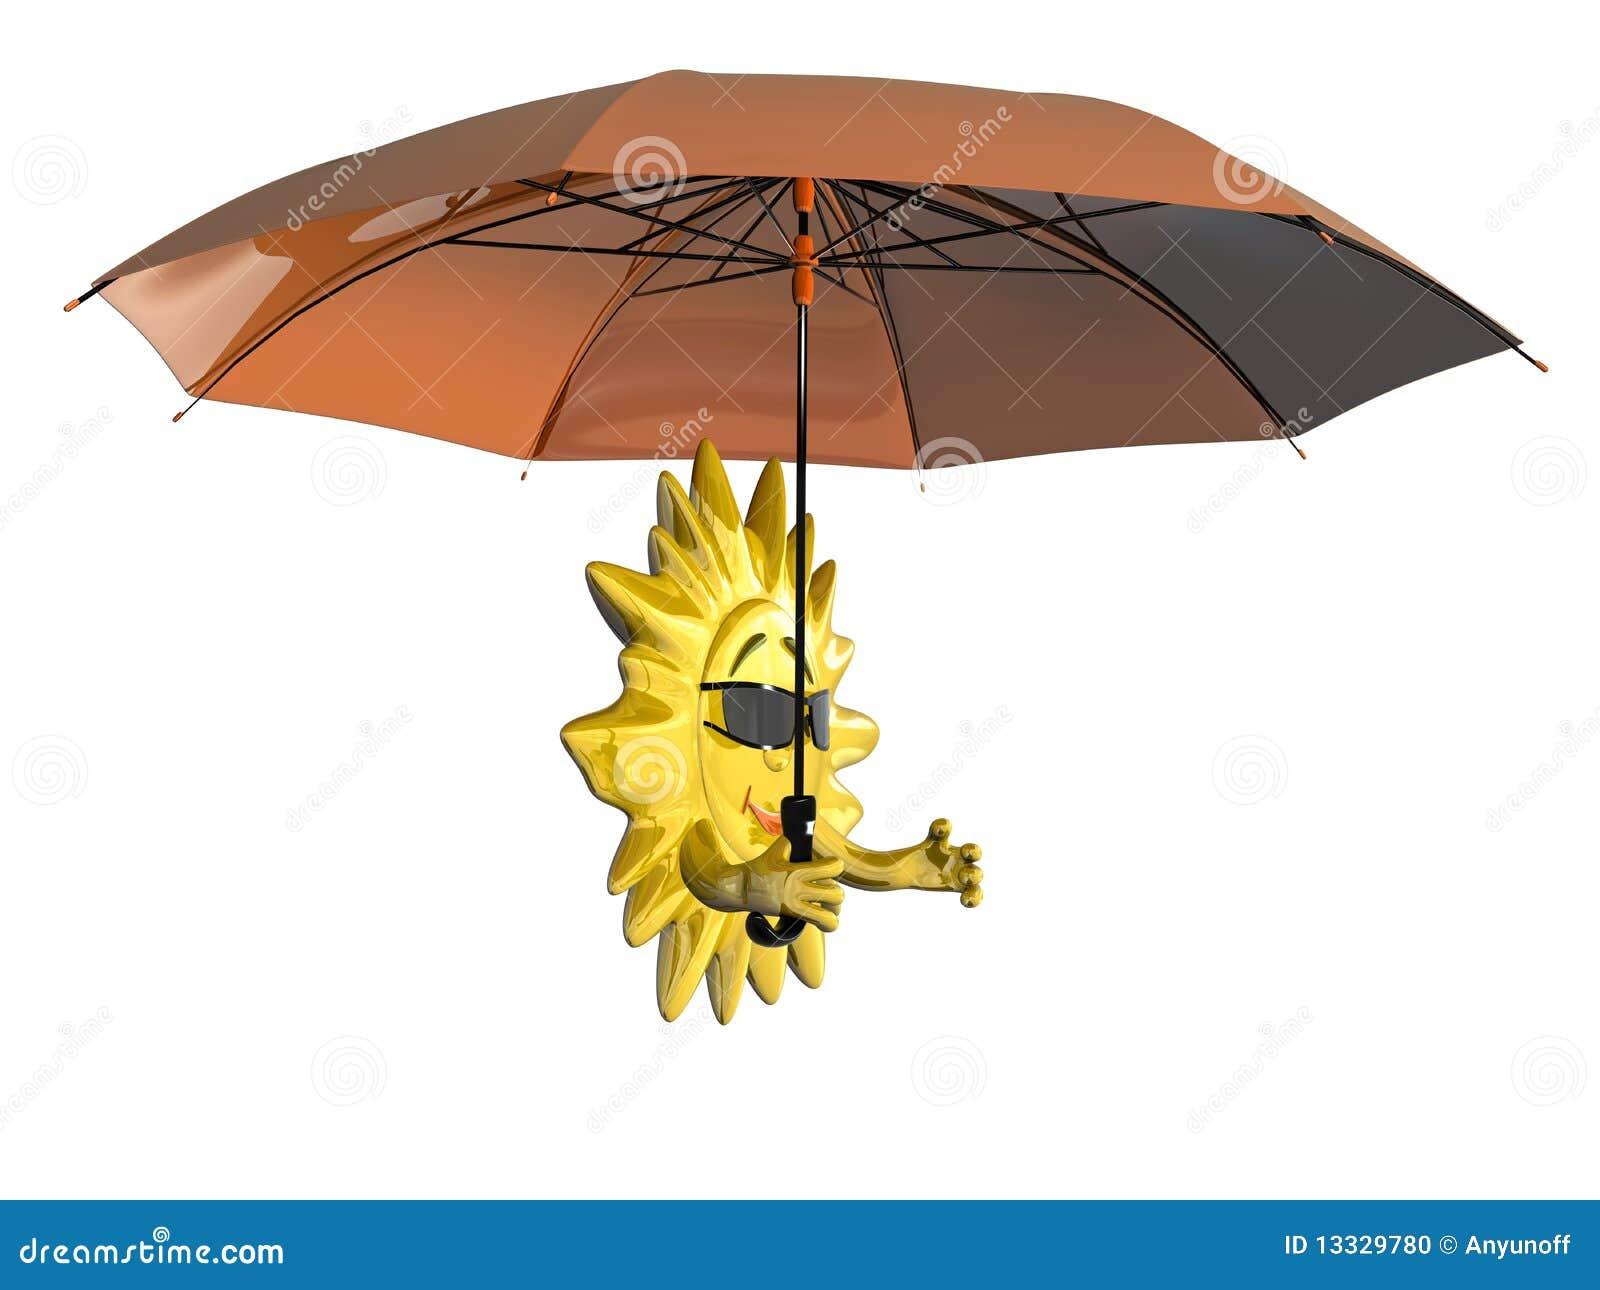 Cartoon sun with umbrella